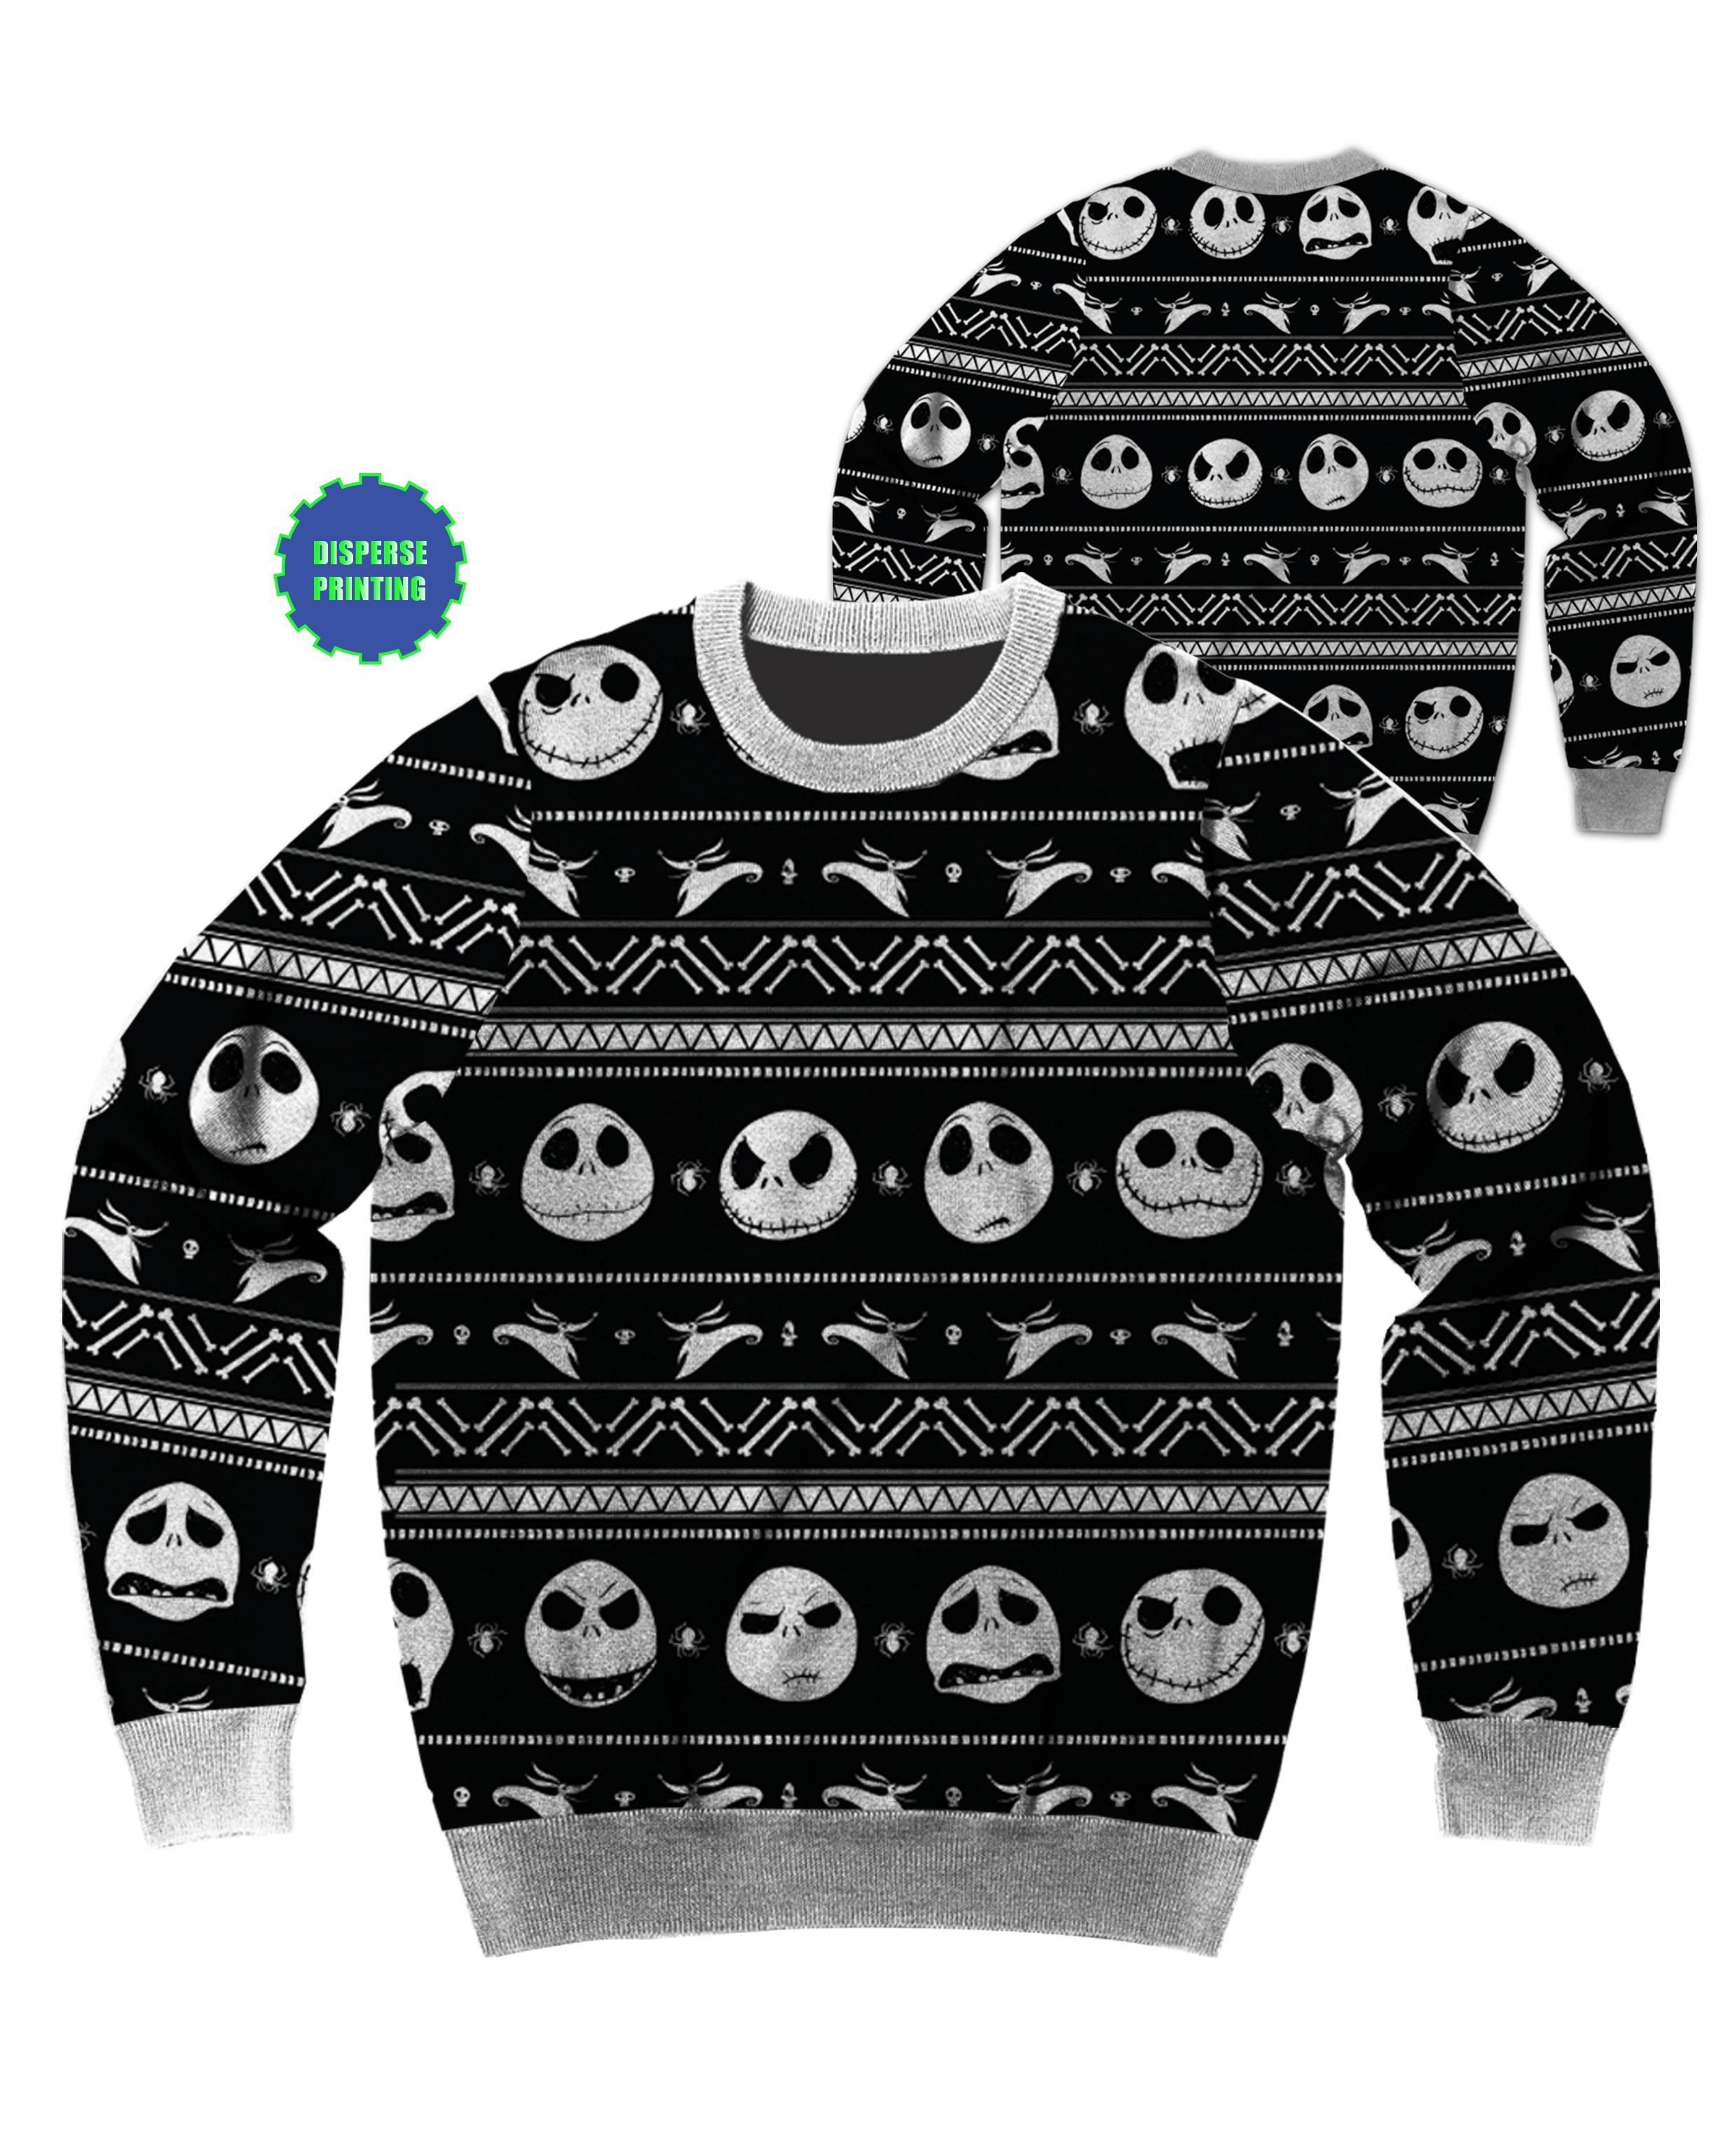 Disney Ugly Christmas Sweater.Disney Nightmare Before Christmas Patterned Jack Ugly Christmas Sweater Medium